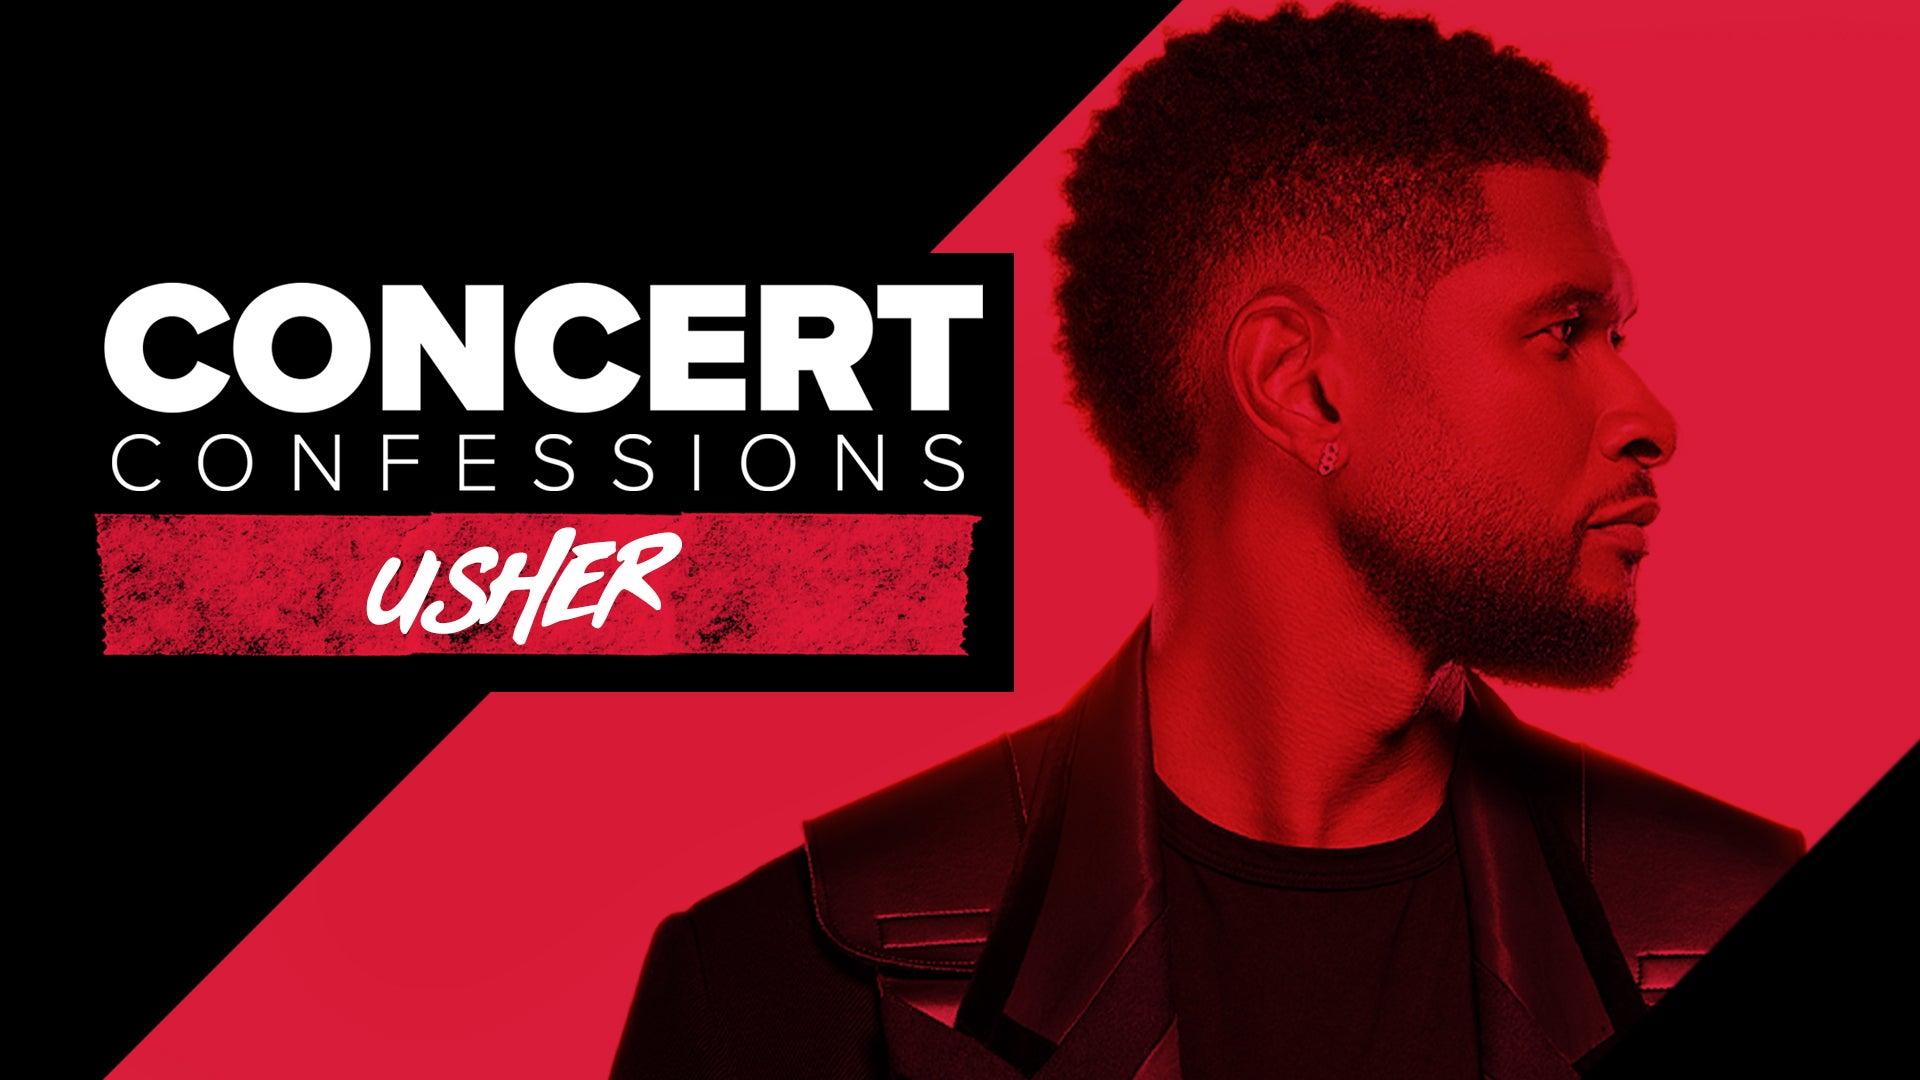 Concert Confessions: Usher